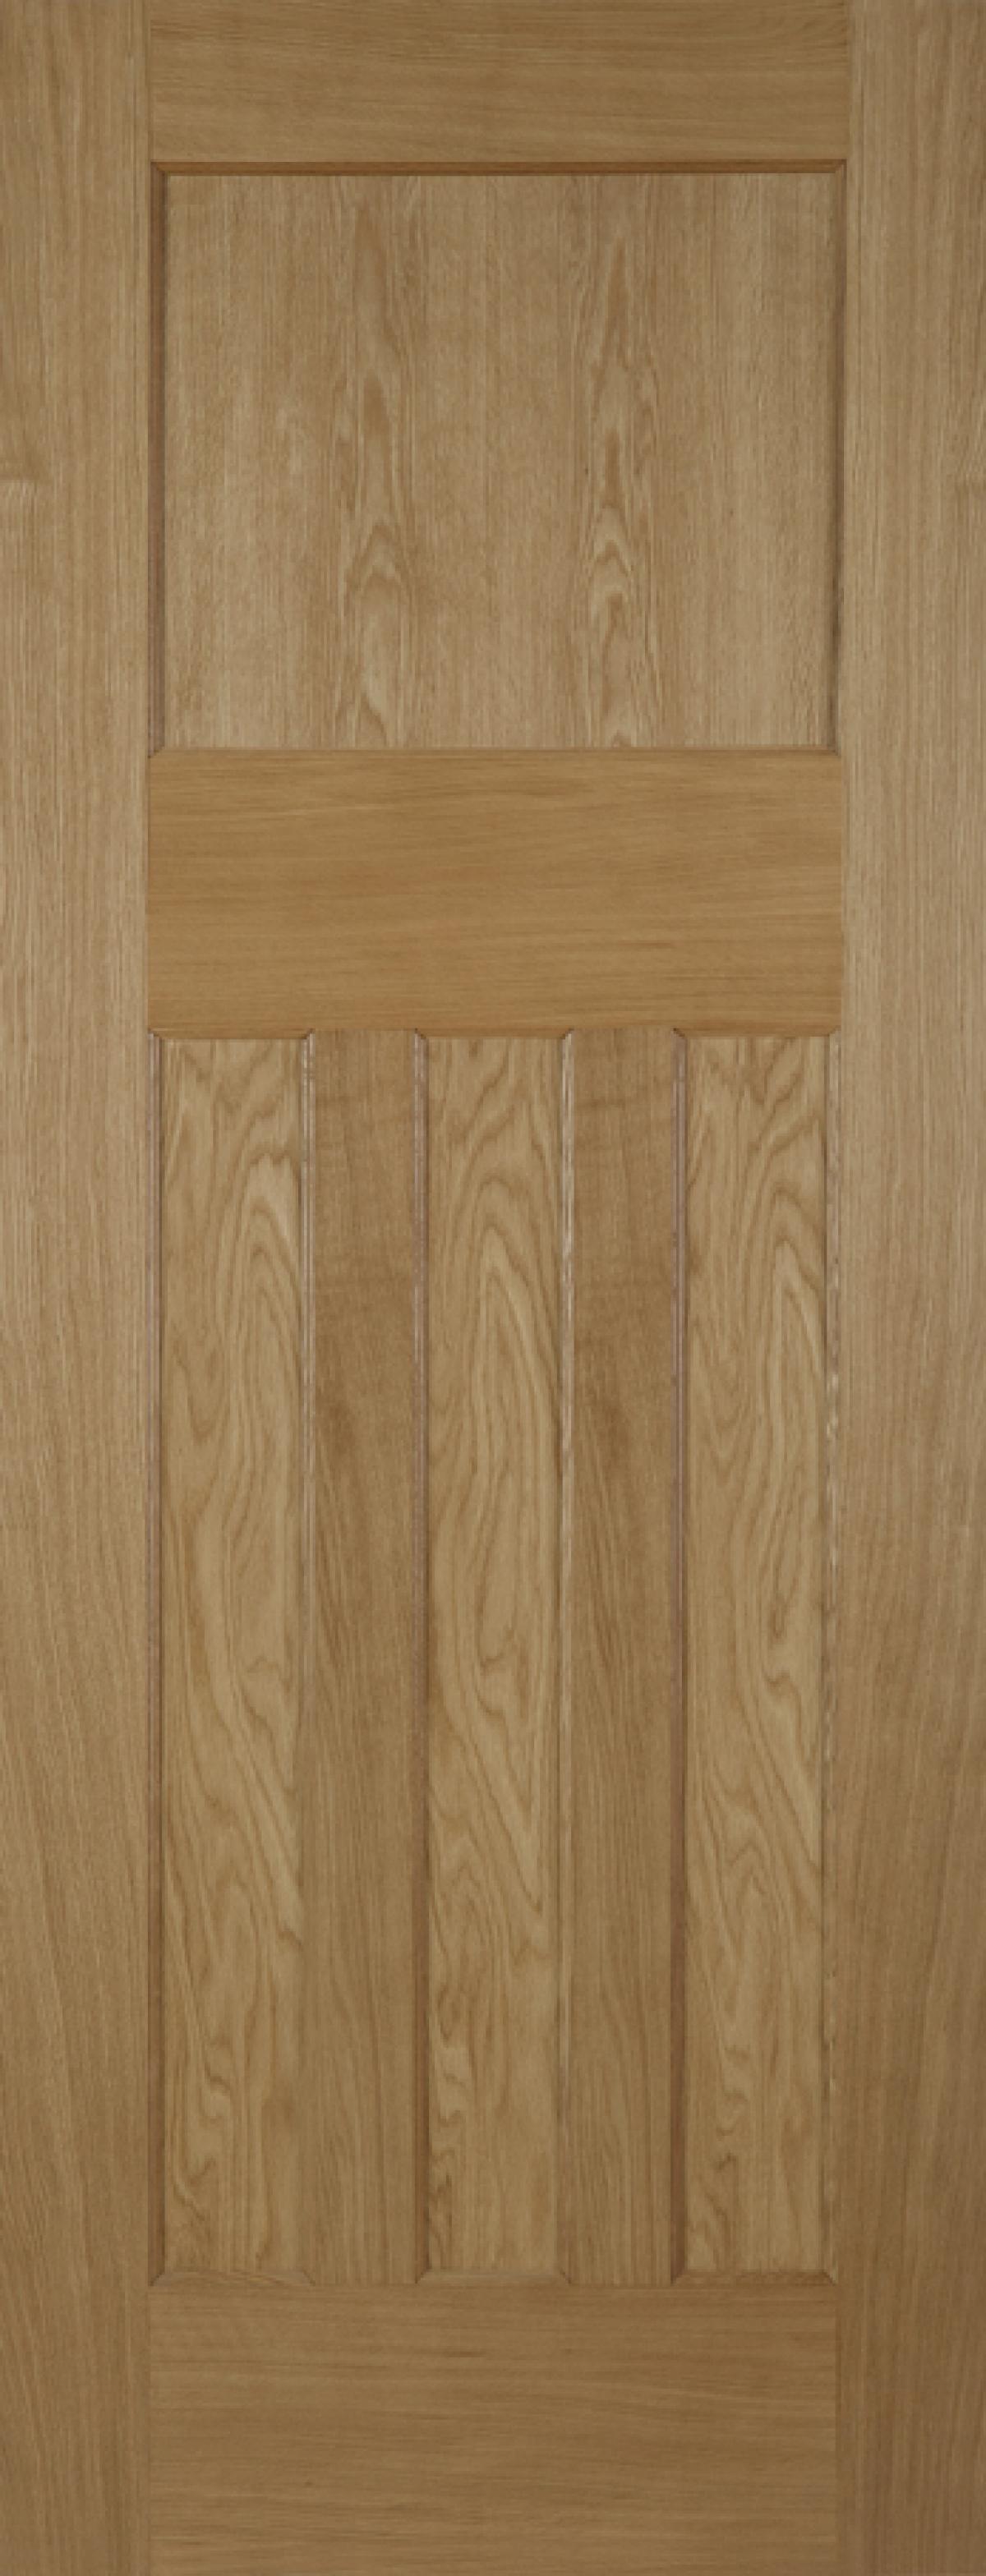 Oak 1930 4 Panel